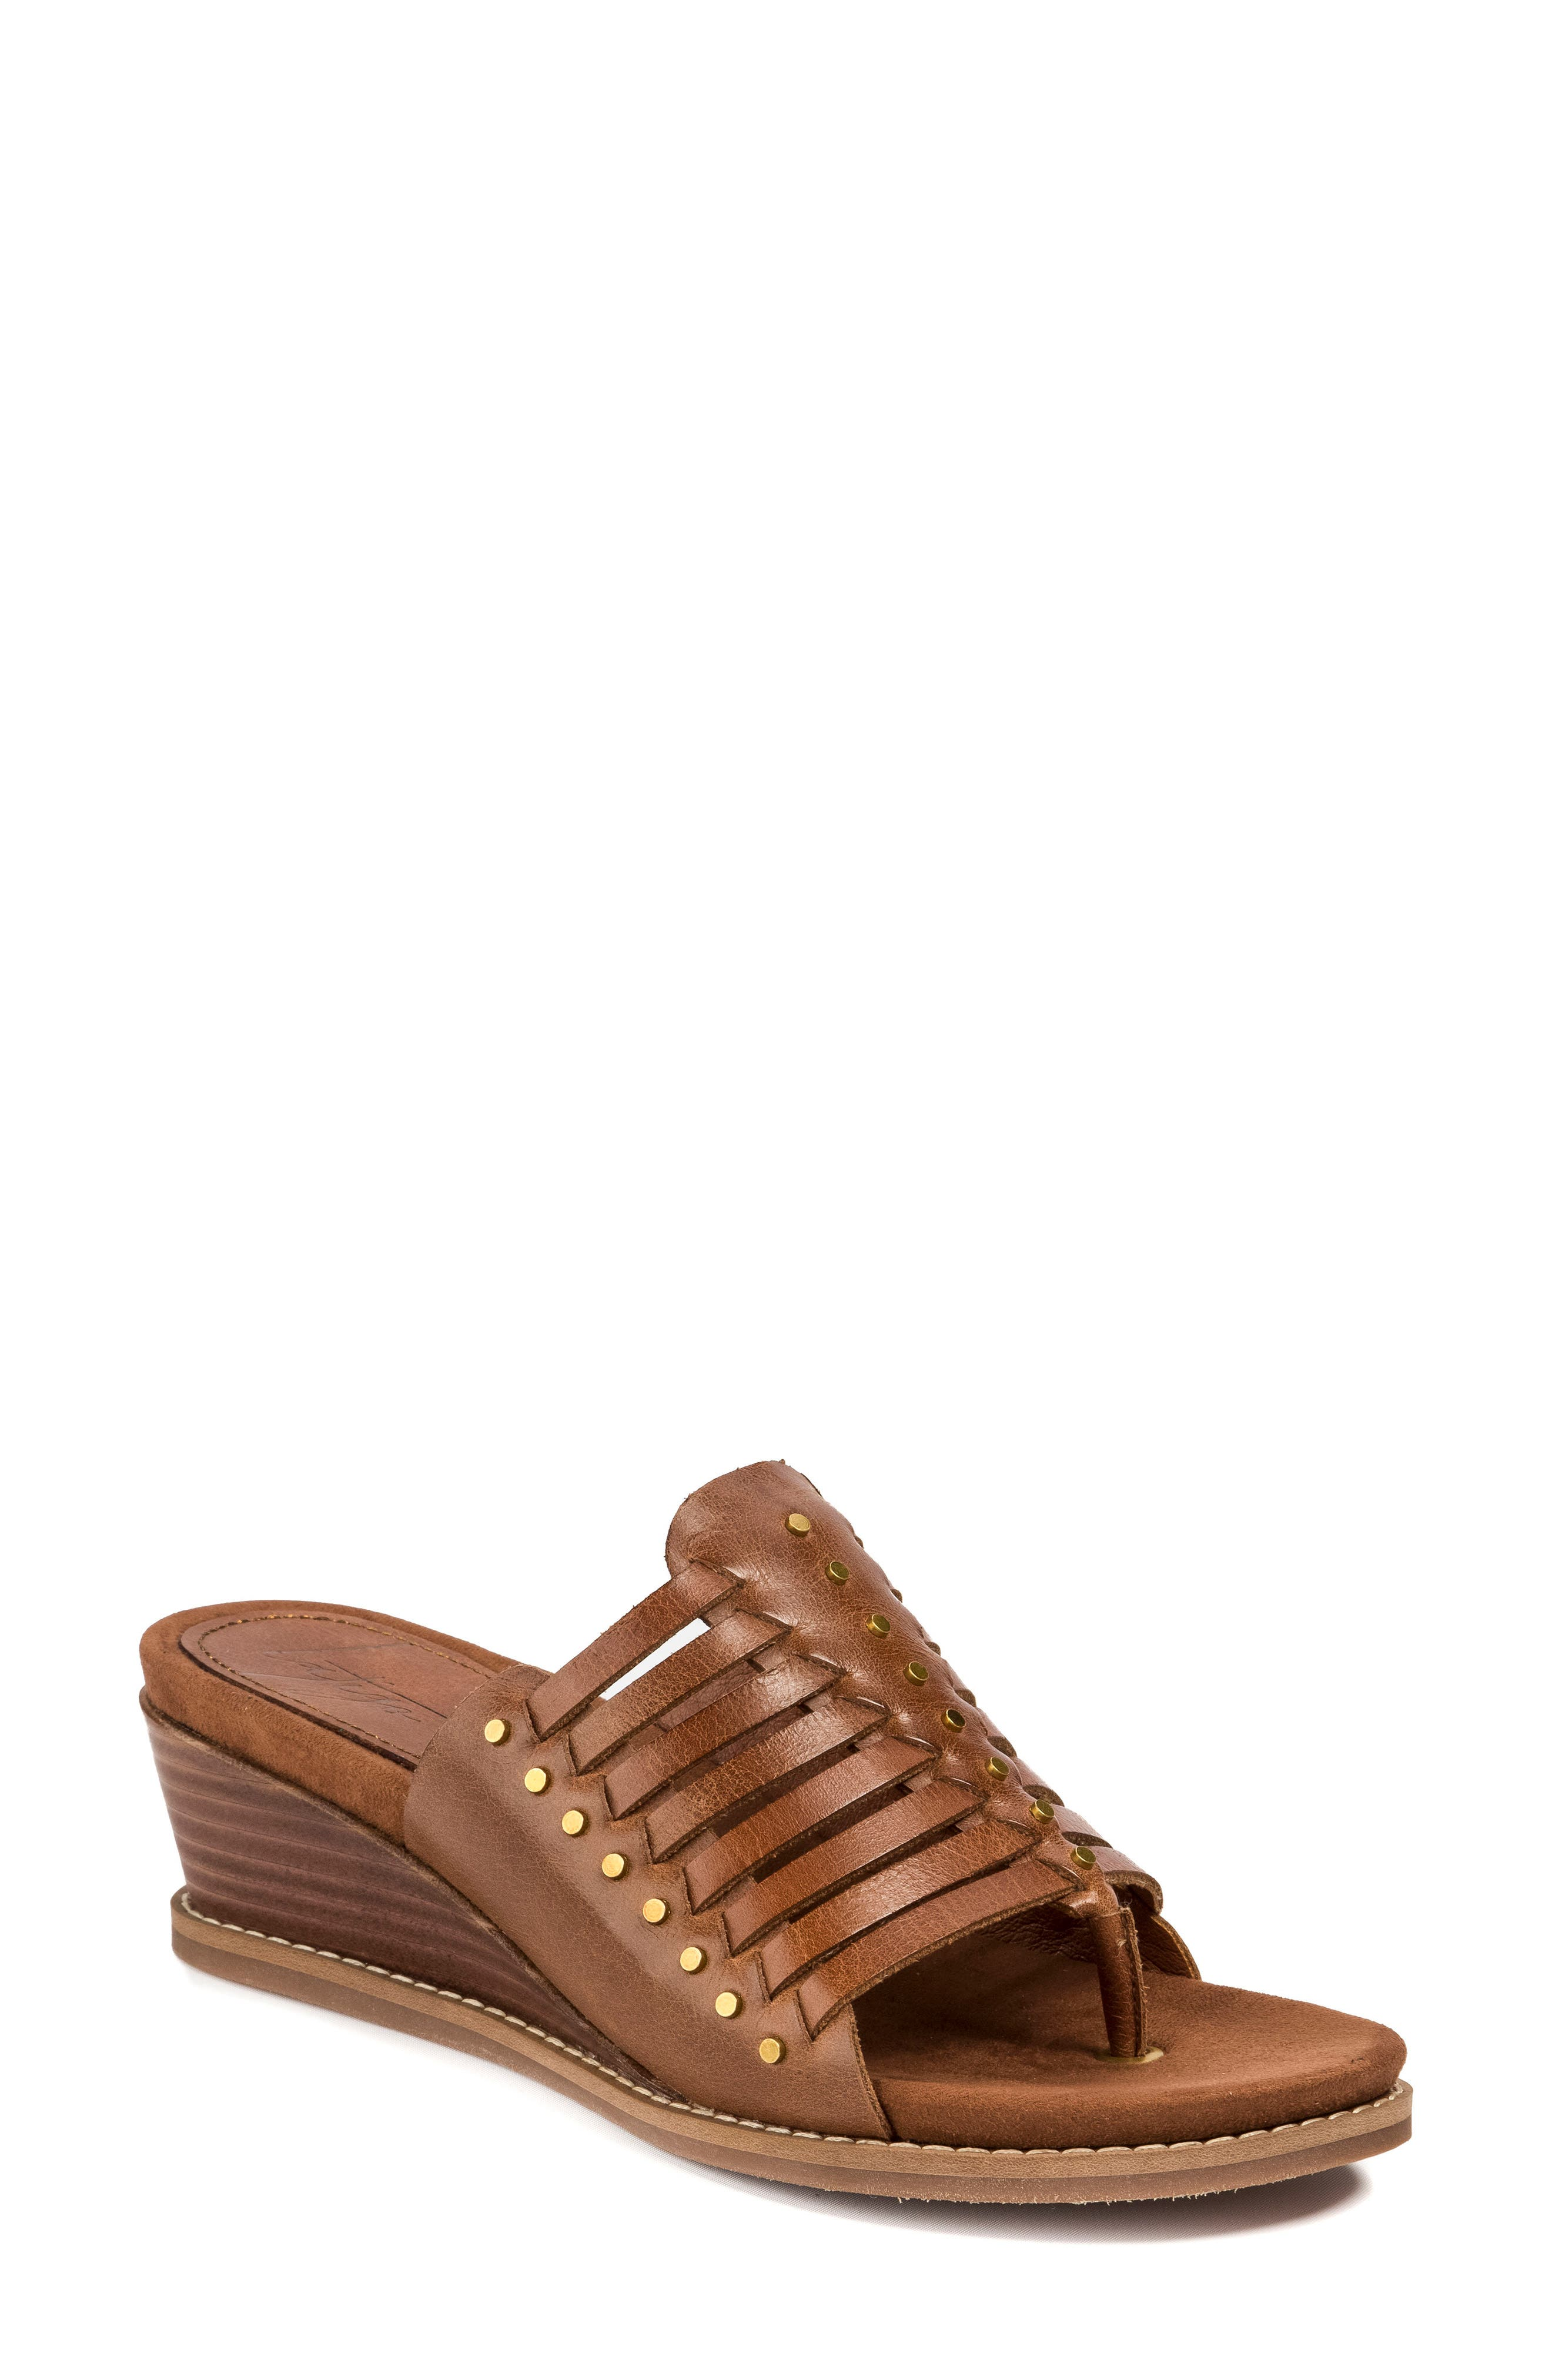 Winnie Wedge Sandal,                         Main,                         color, Brush Brown Leather